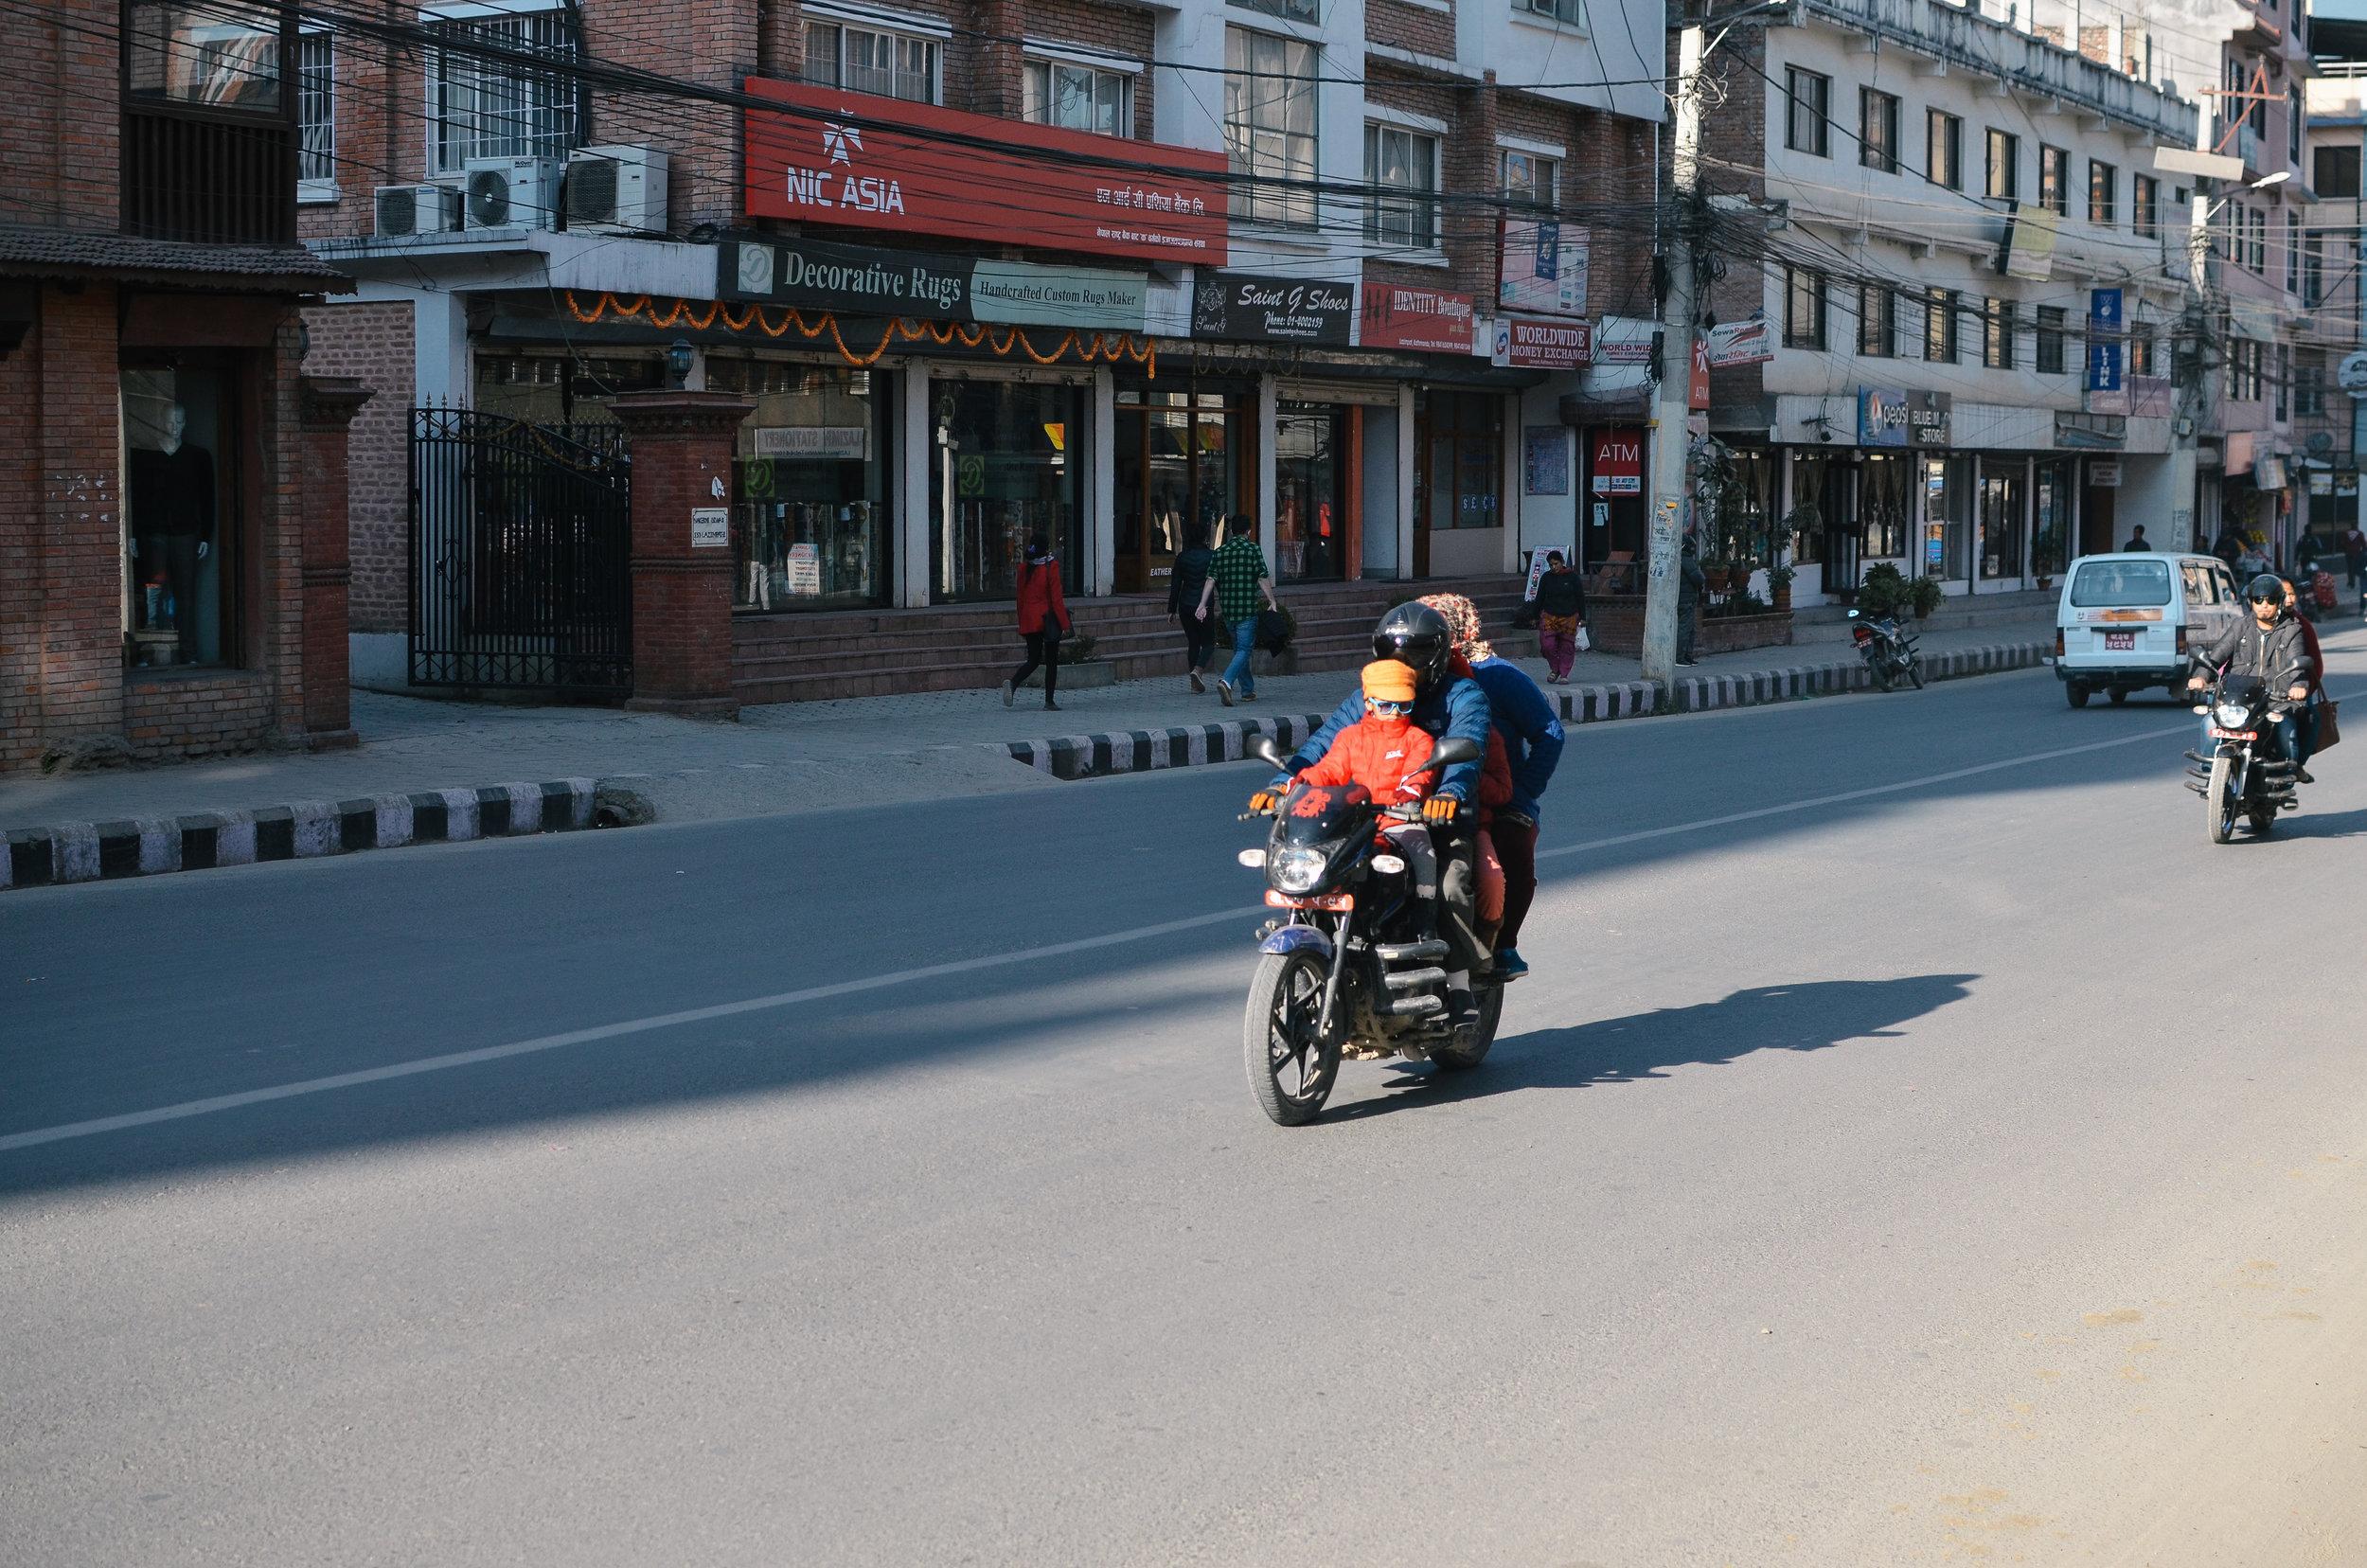 10-things-to-know-kathmandu-nepal-lifeonpine_DSC_0549.jpg